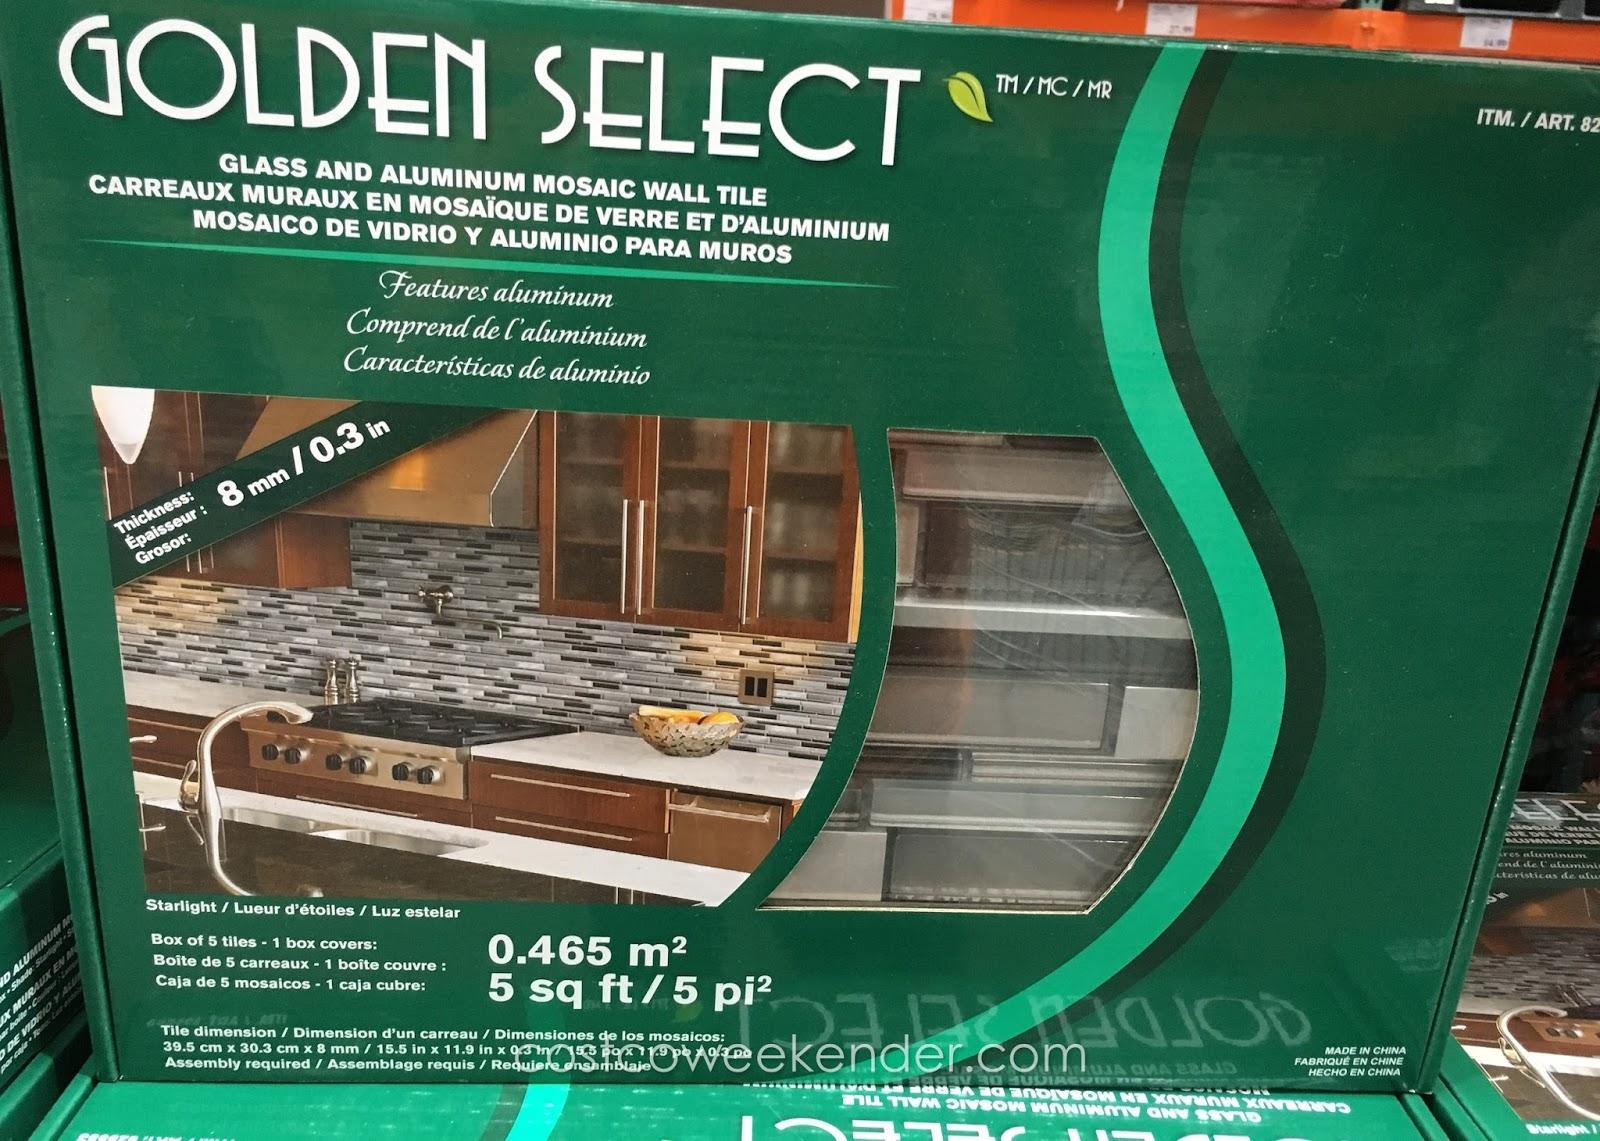 Golden Select Starlight Glass And Aluminum Mosaic Wall